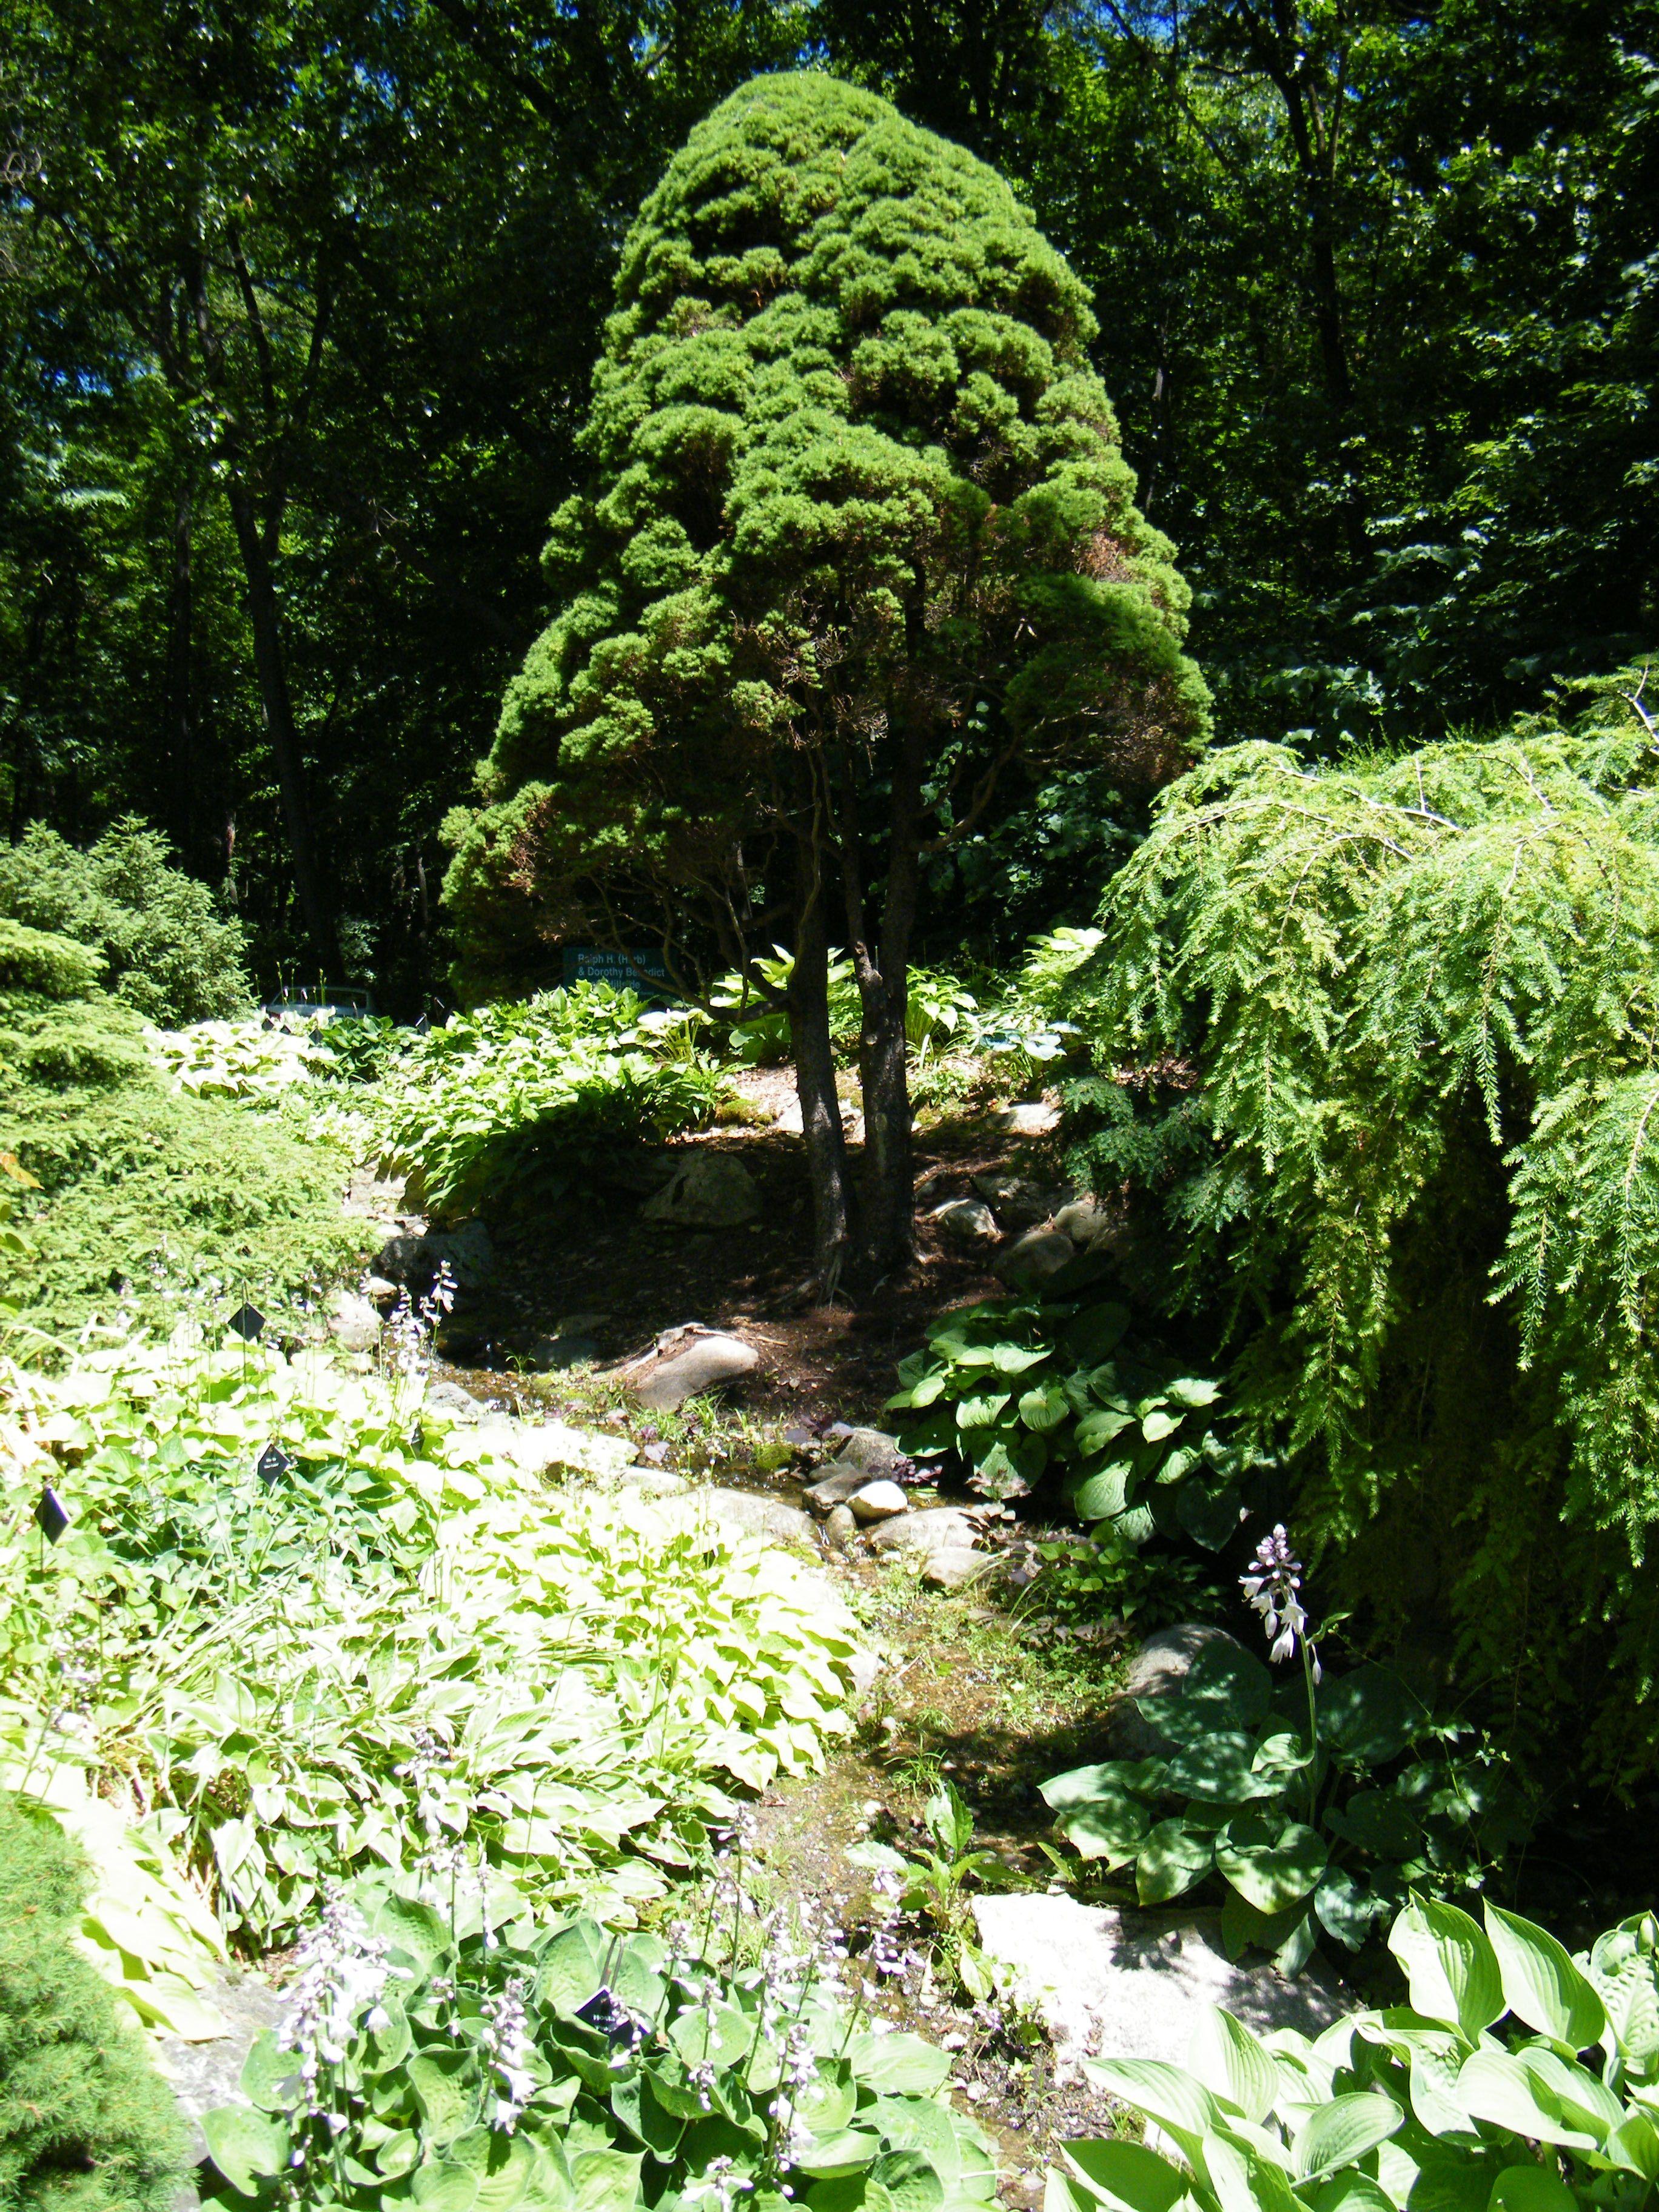 a9d5bda61922c7405b4013054166b168 - Hidden Lake Gardens In Tipton Michigan